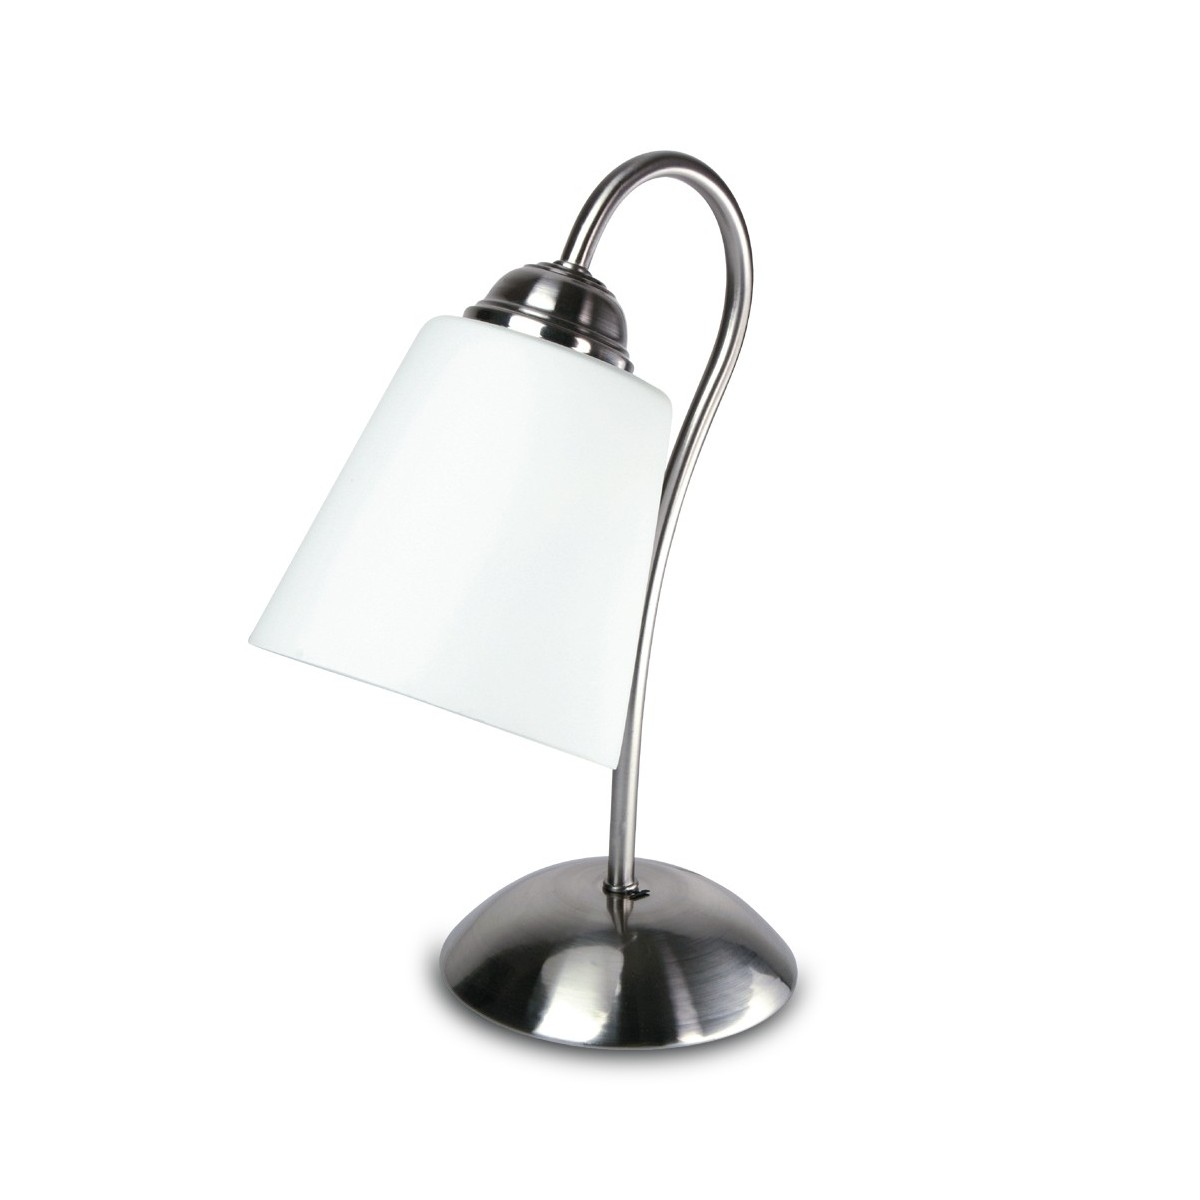 Lampada Da Comodino Argento.I 1162 L Nik 8031414088966 Fan Europe Lighting Lumetto Argento 1162